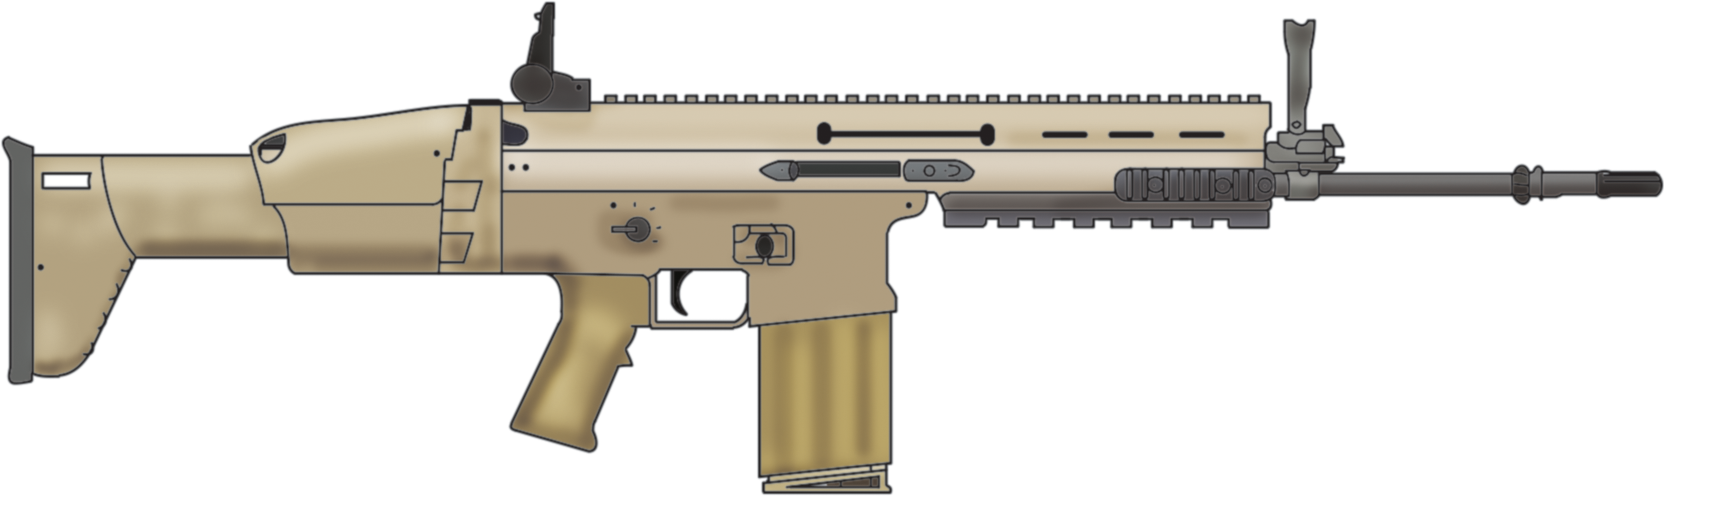 how to use assault rifle long range fortnite